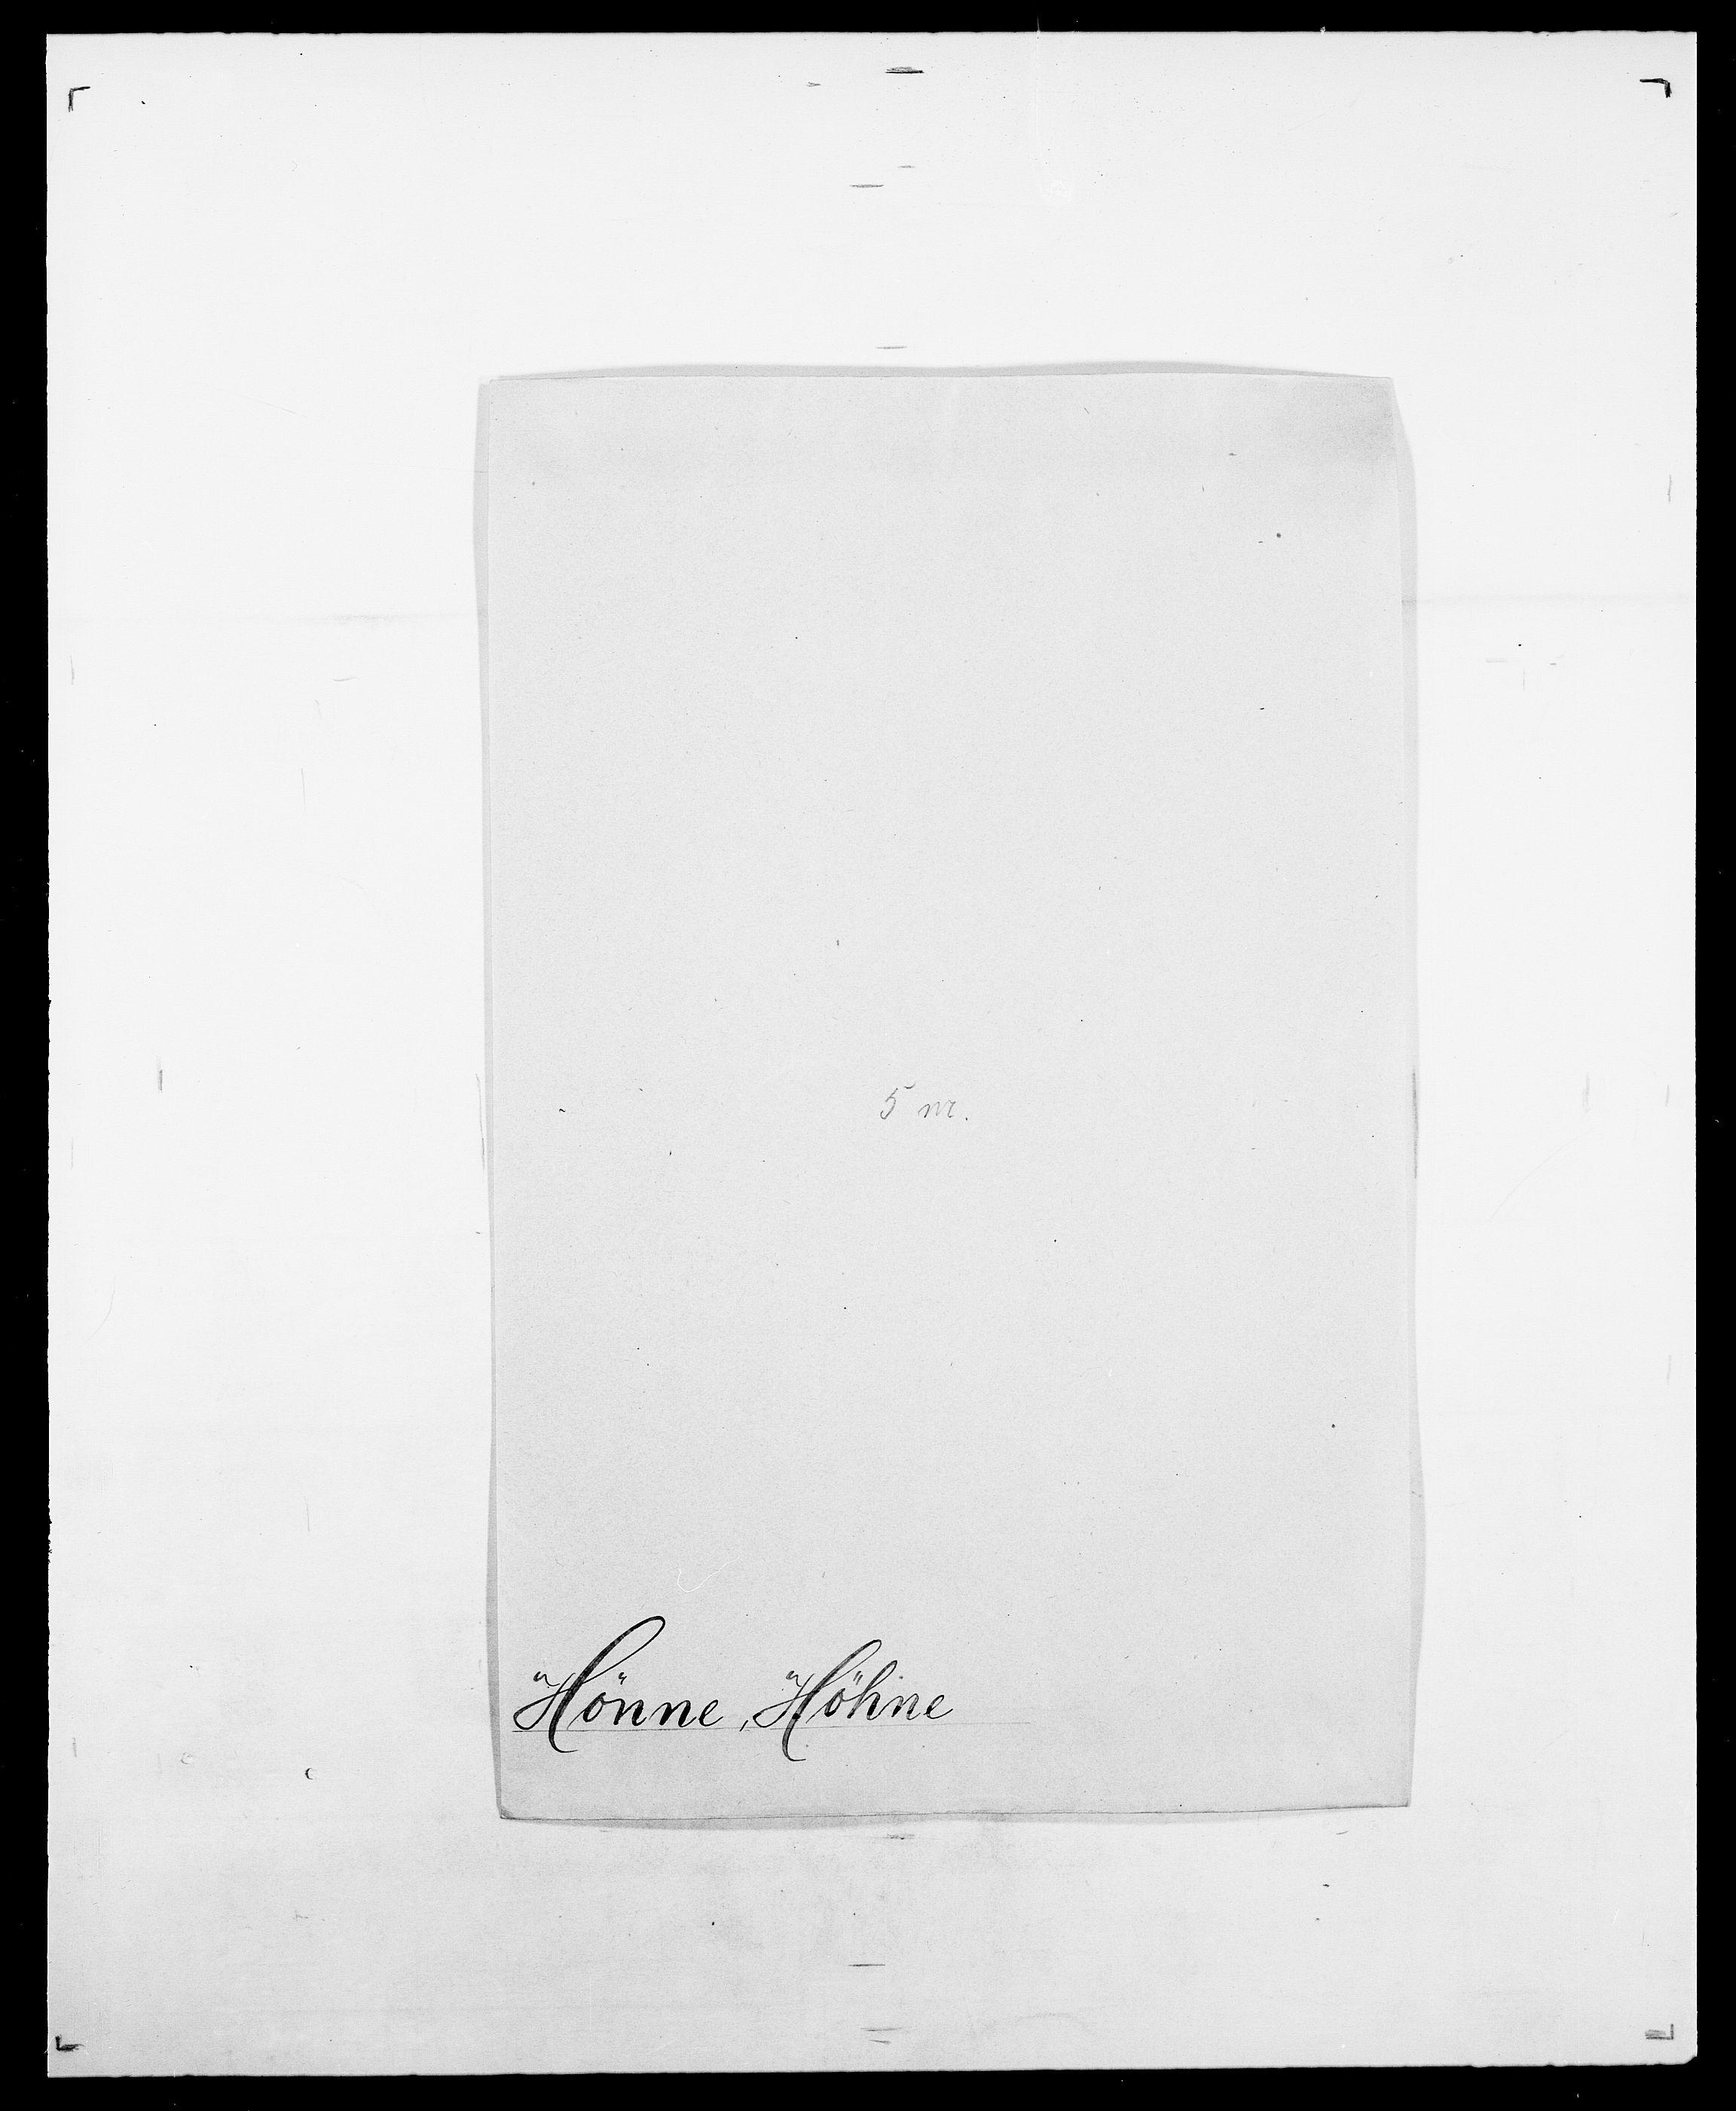 SAO, Delgobe, Charles Antoine - samling, D/Da/L0019: van der Hude - Joys, s. 362